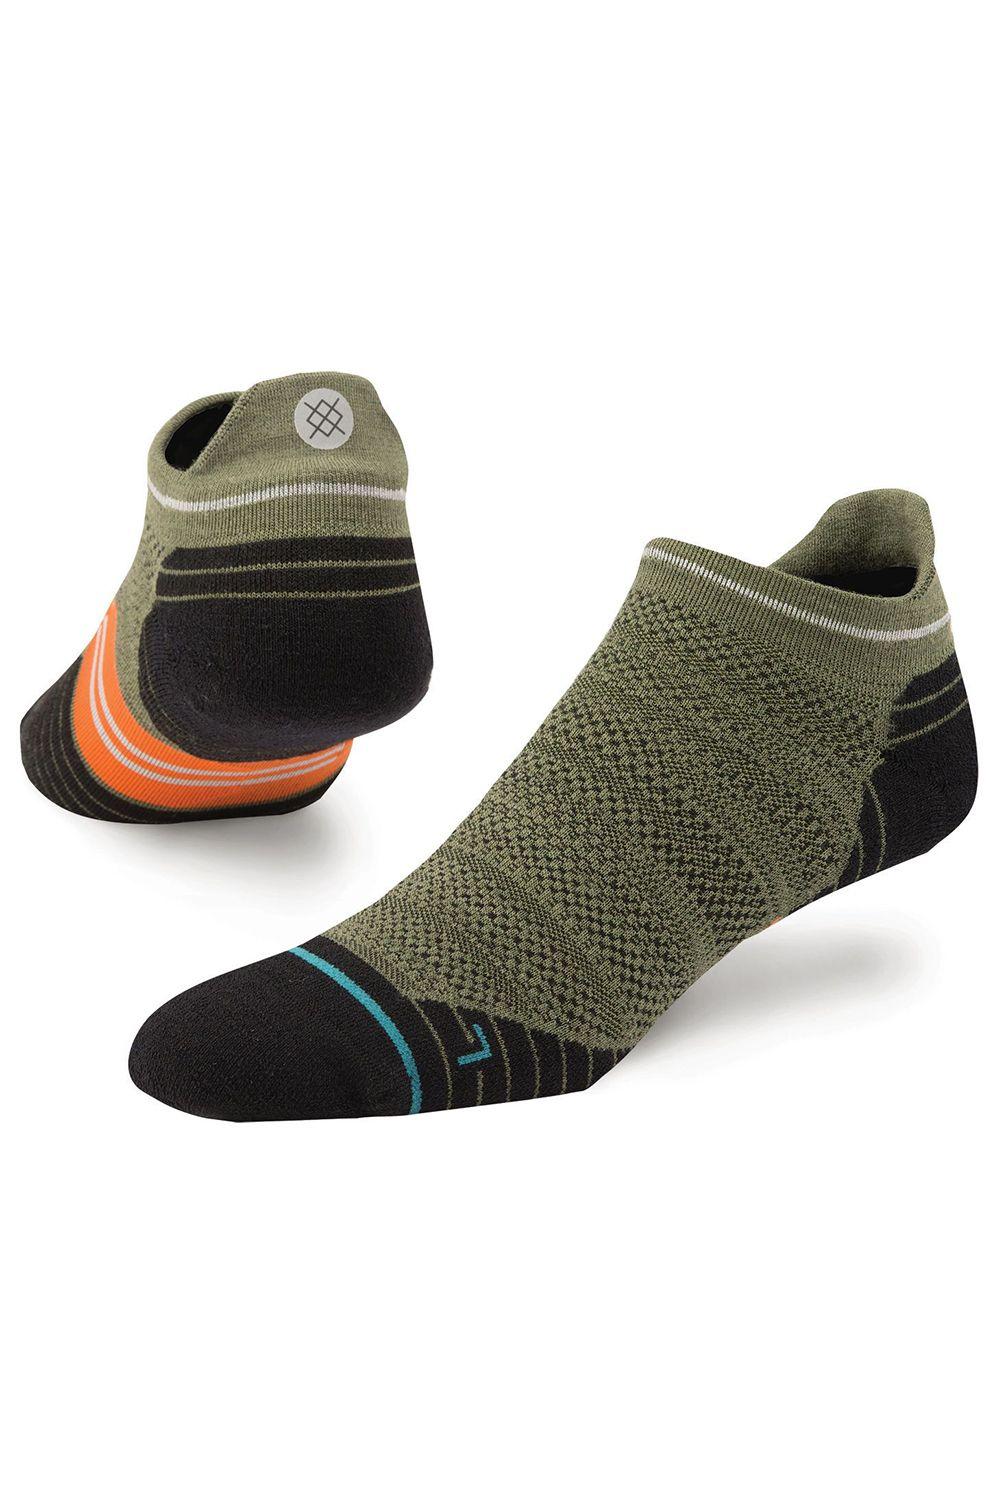 Stance Socks CUDI TAB Olive